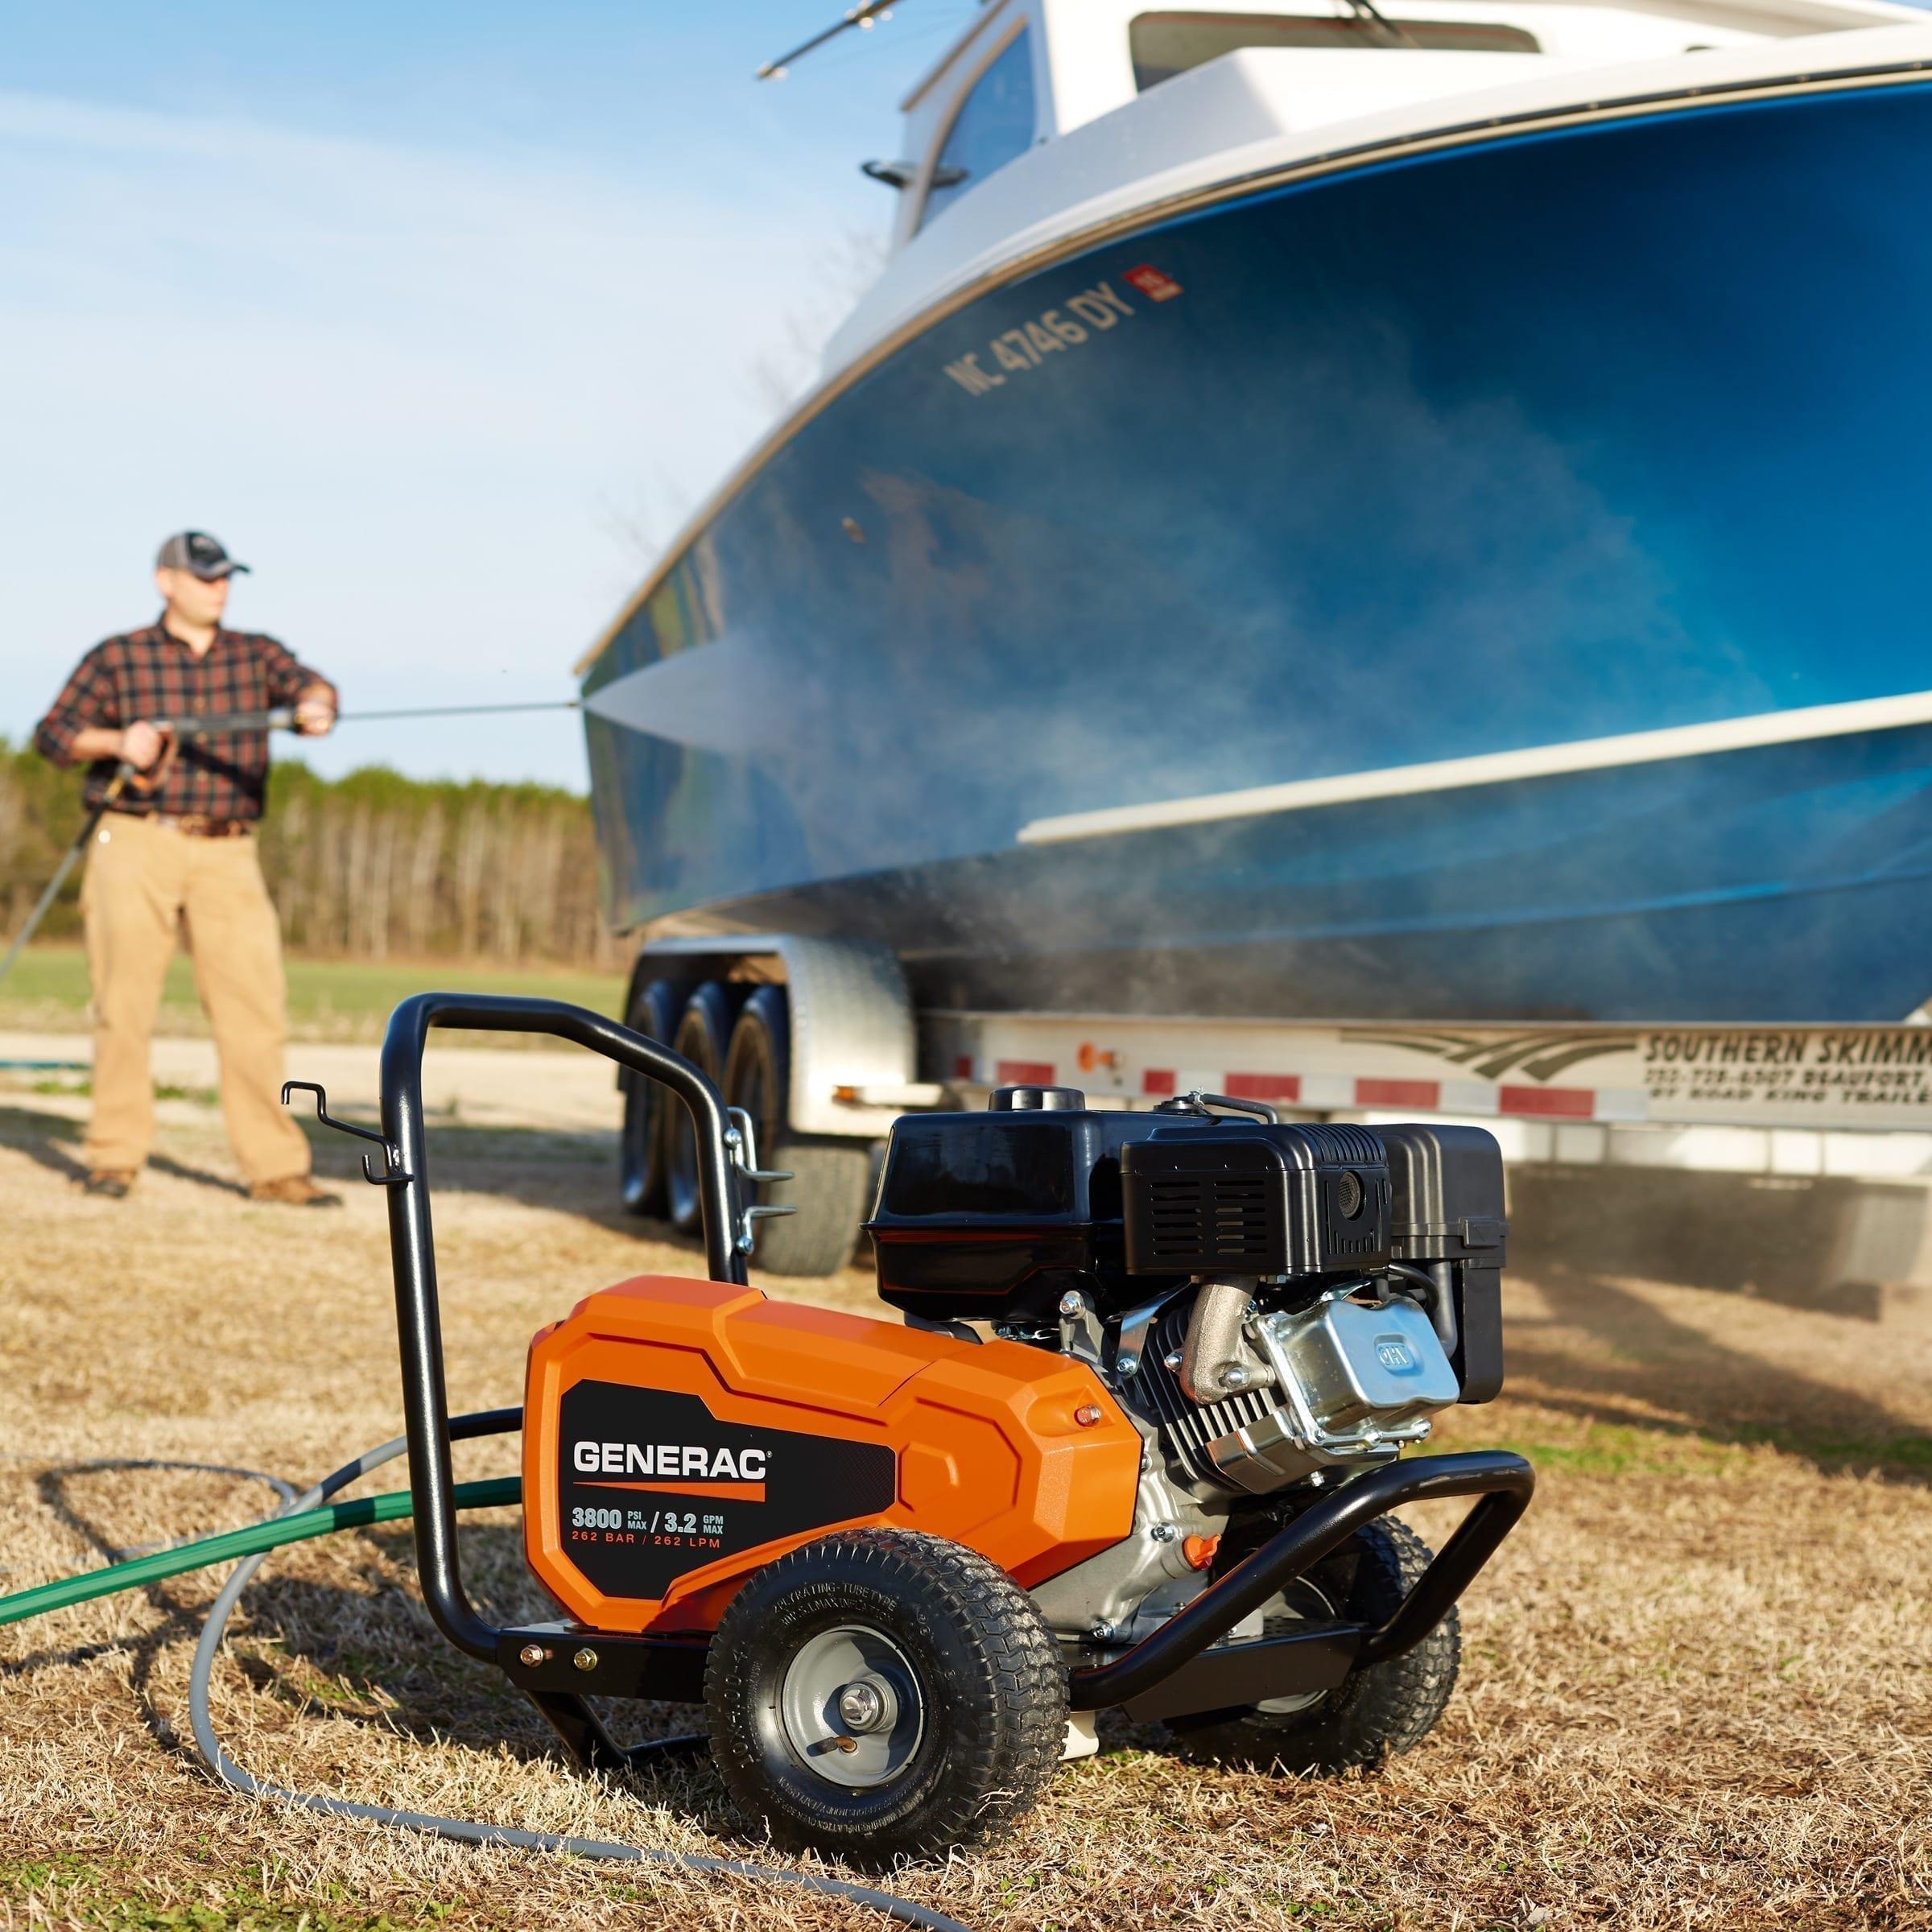 Generac 3800PSI Belt Driven Power Washer on Boat